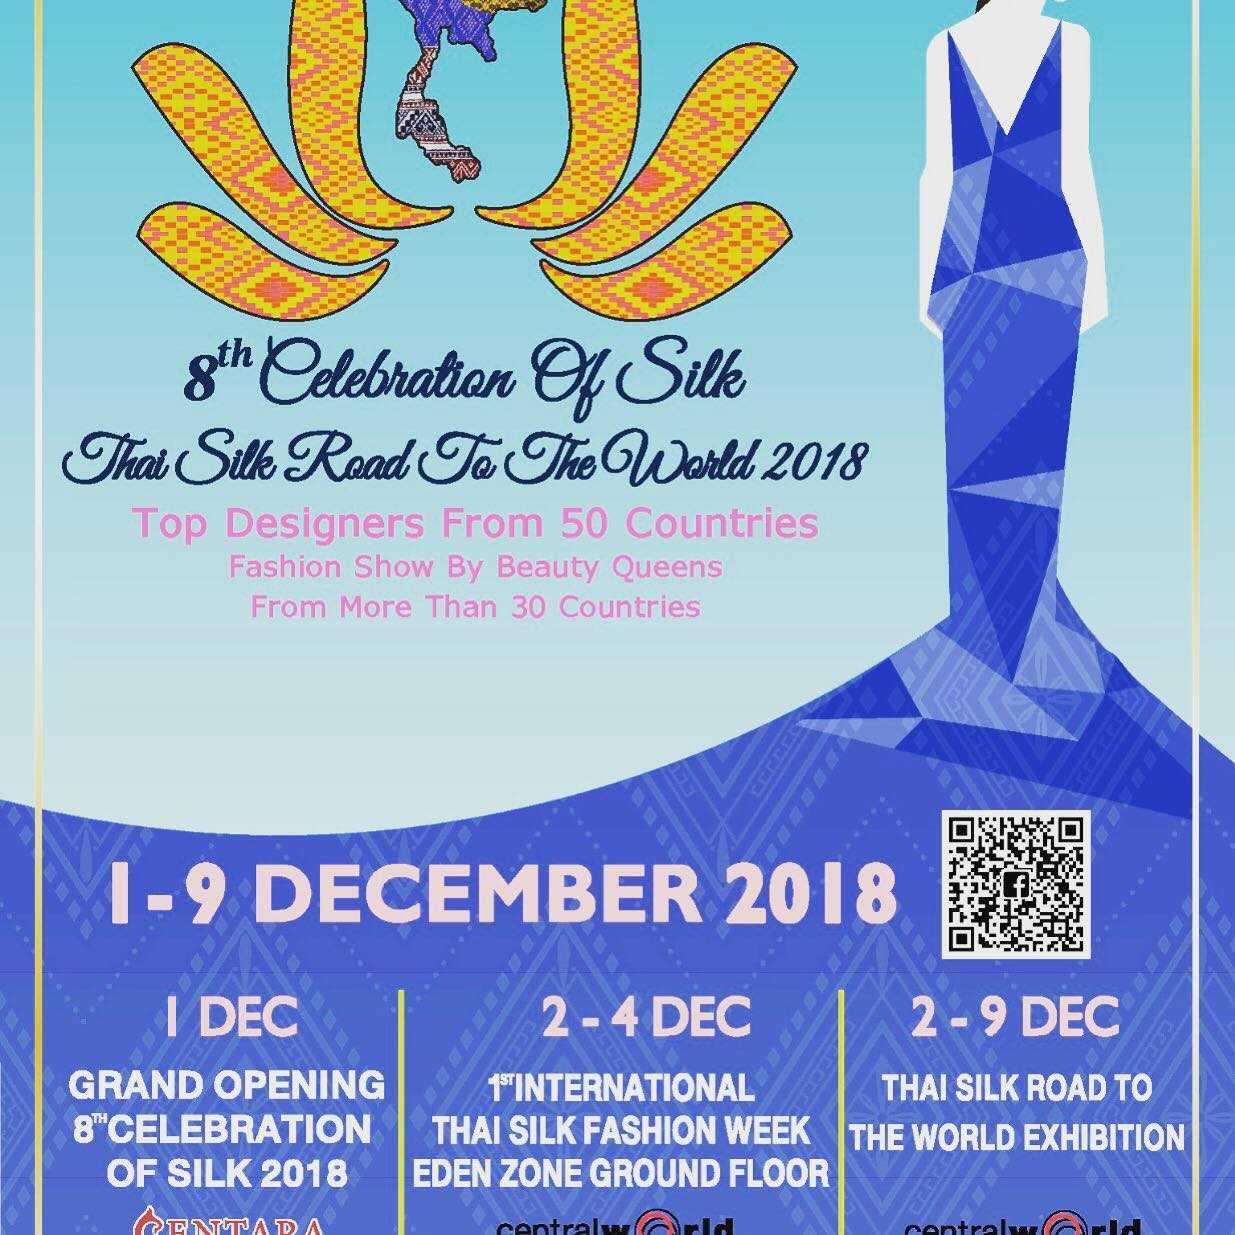 Young Danish Fashion Designer showcases styles at Celebration of Silk and Bangkok Thai Silk Fashion Week 2018  1-9 December 2018